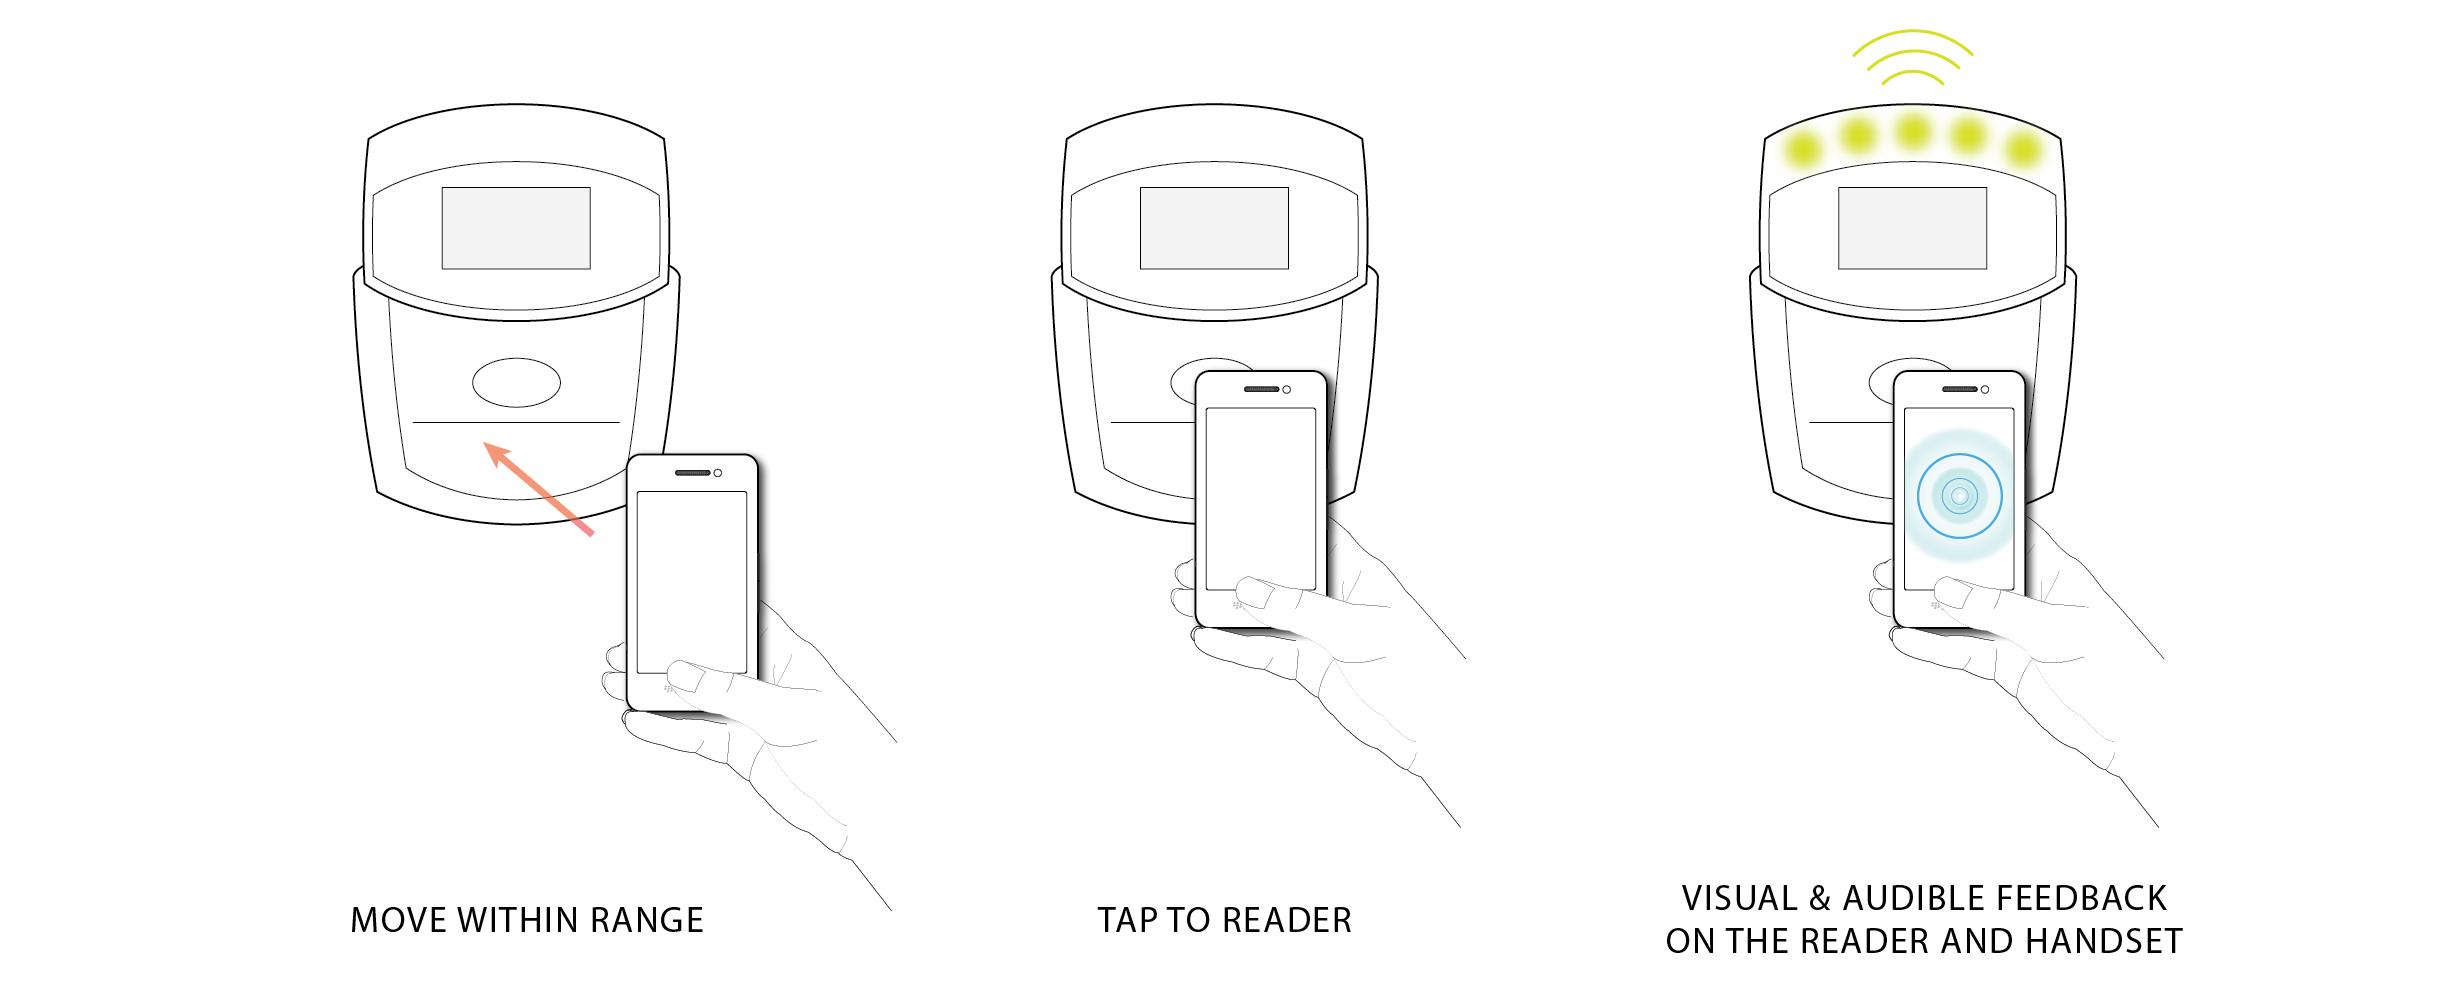 Handset to Reader